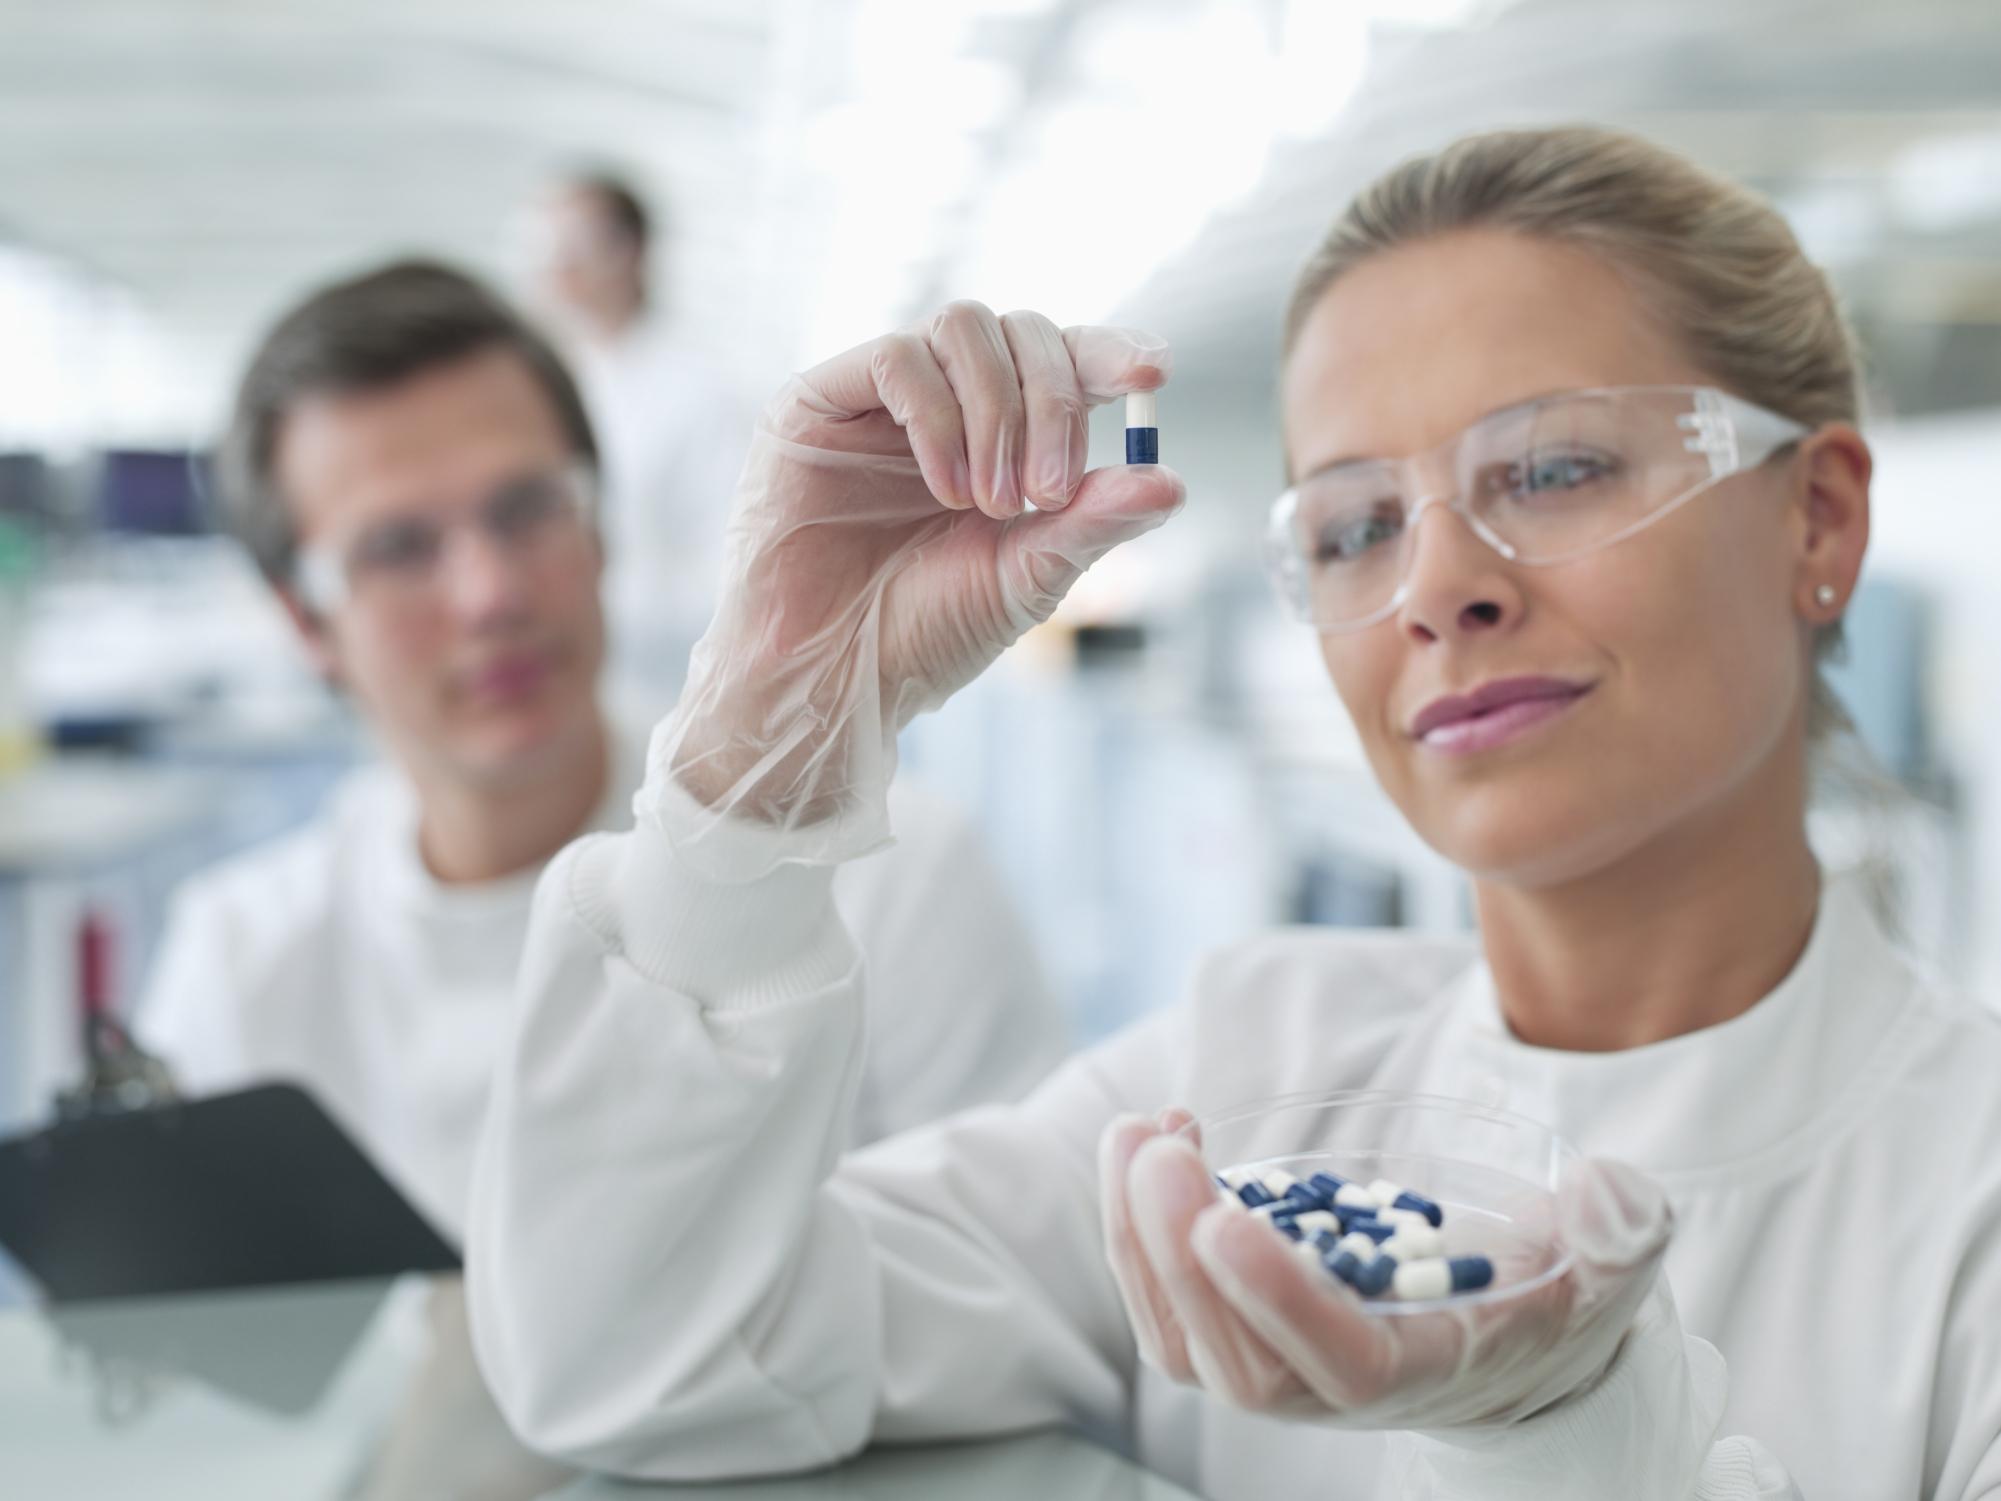 A biotech lab researcher examining a pill.